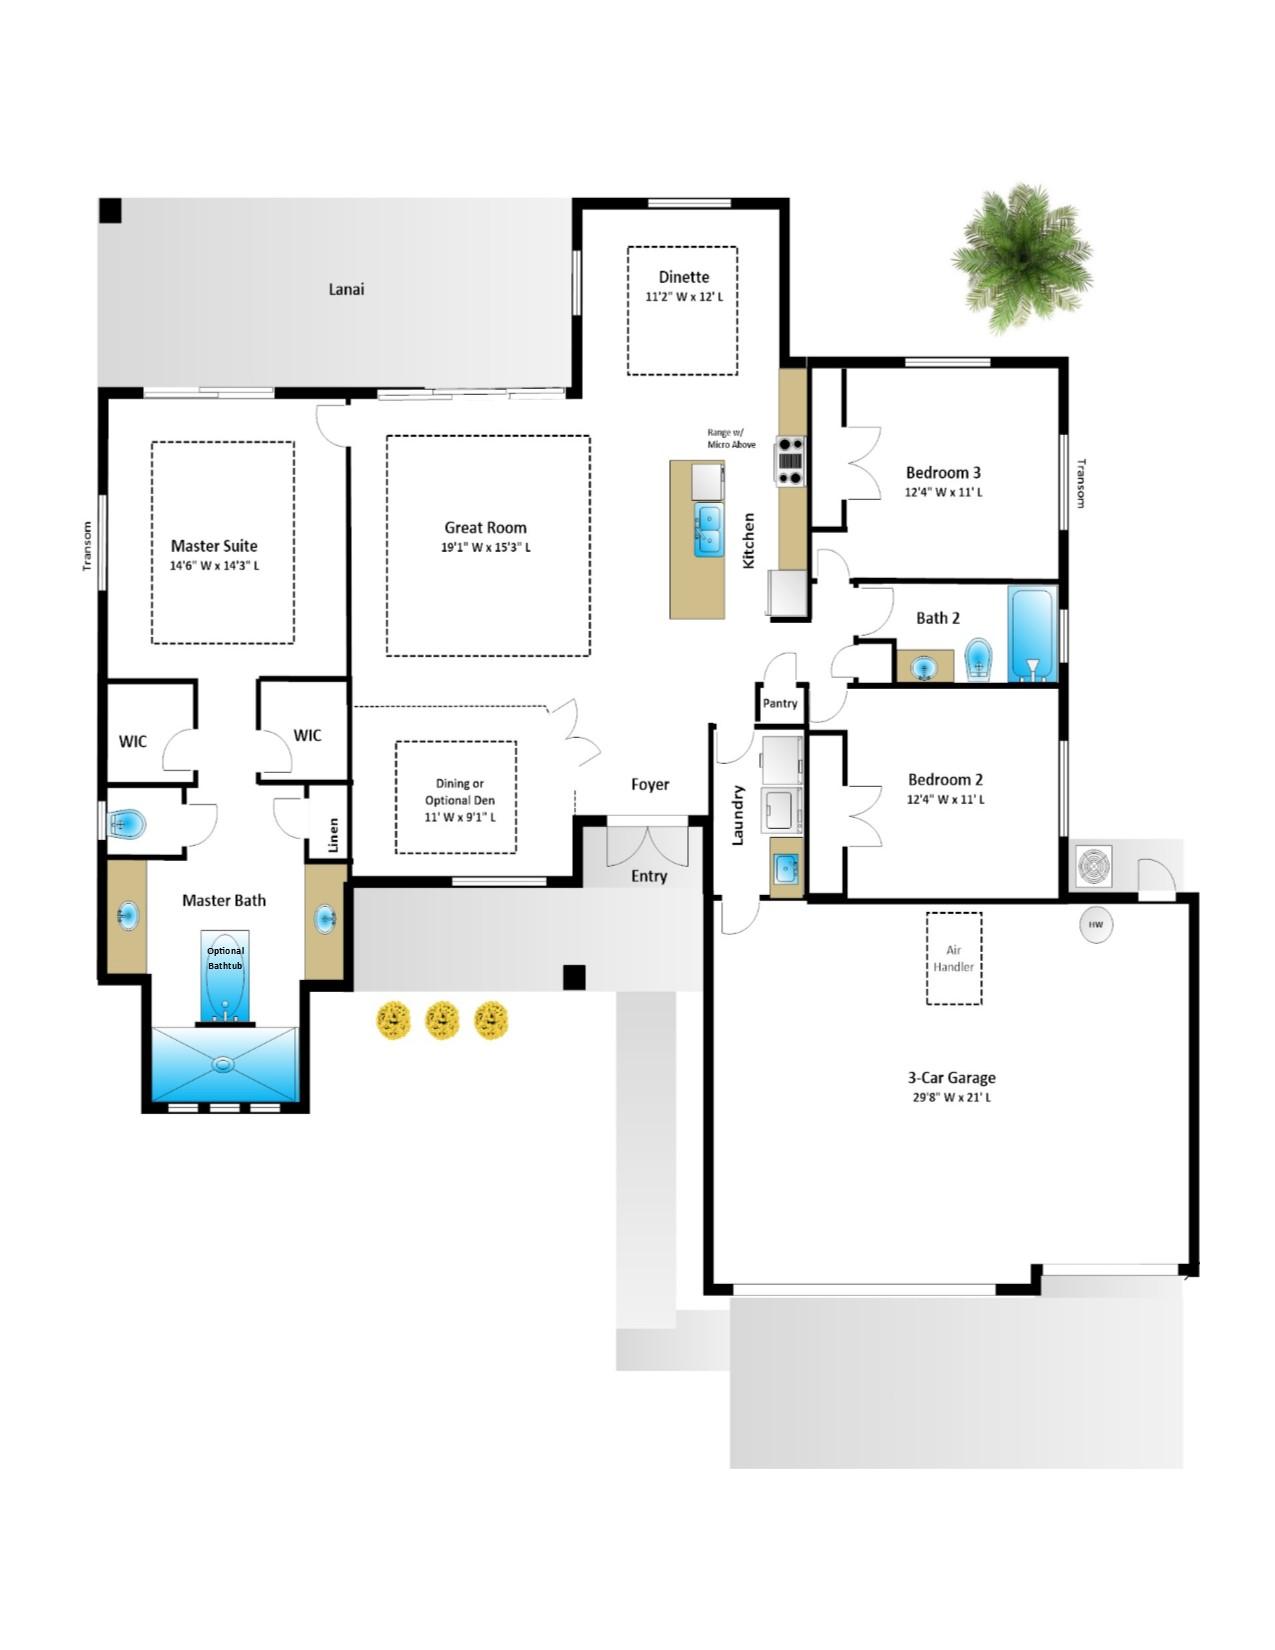 Jacaranda – 3 Bedroom 2 Bath 3 Car Garage